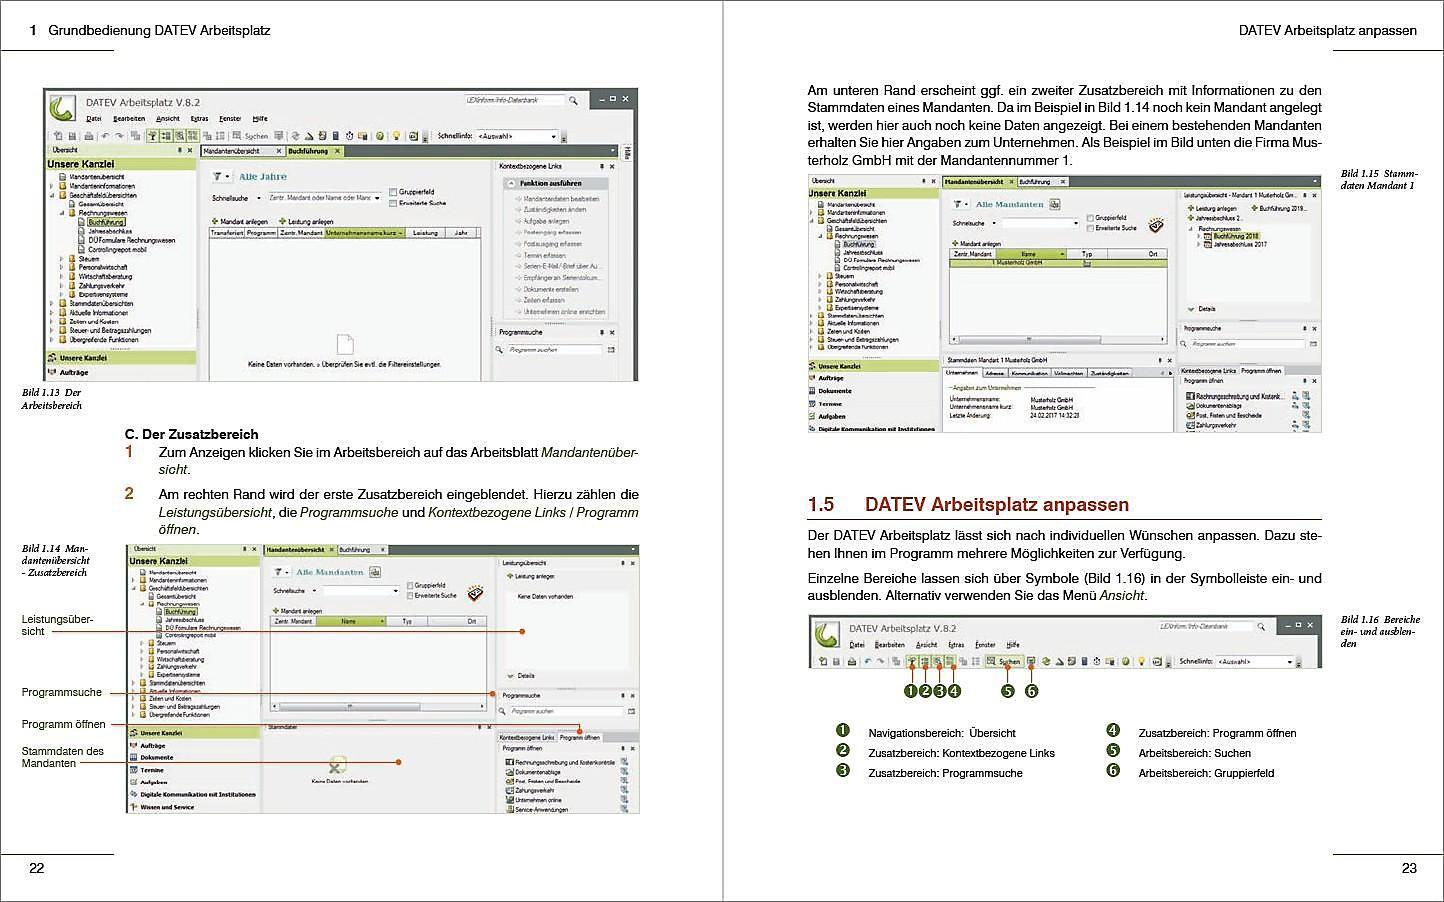 Praxisnahe Finanzbuchhaltung Mit Datev Kanzlei Rechnungswesen Buch